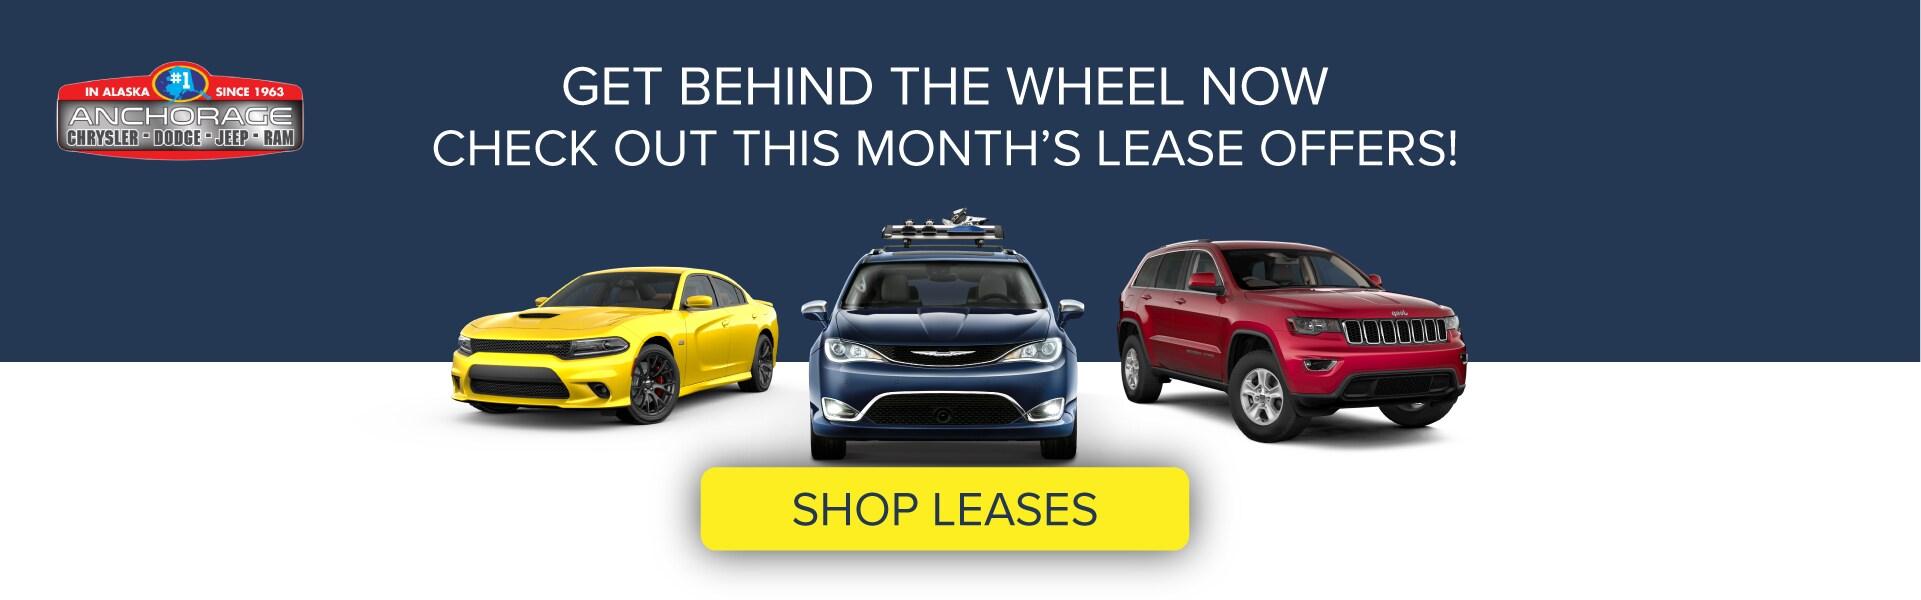 Auto Leasing Specials Anchorage Cdjr Center Wasilla Ak